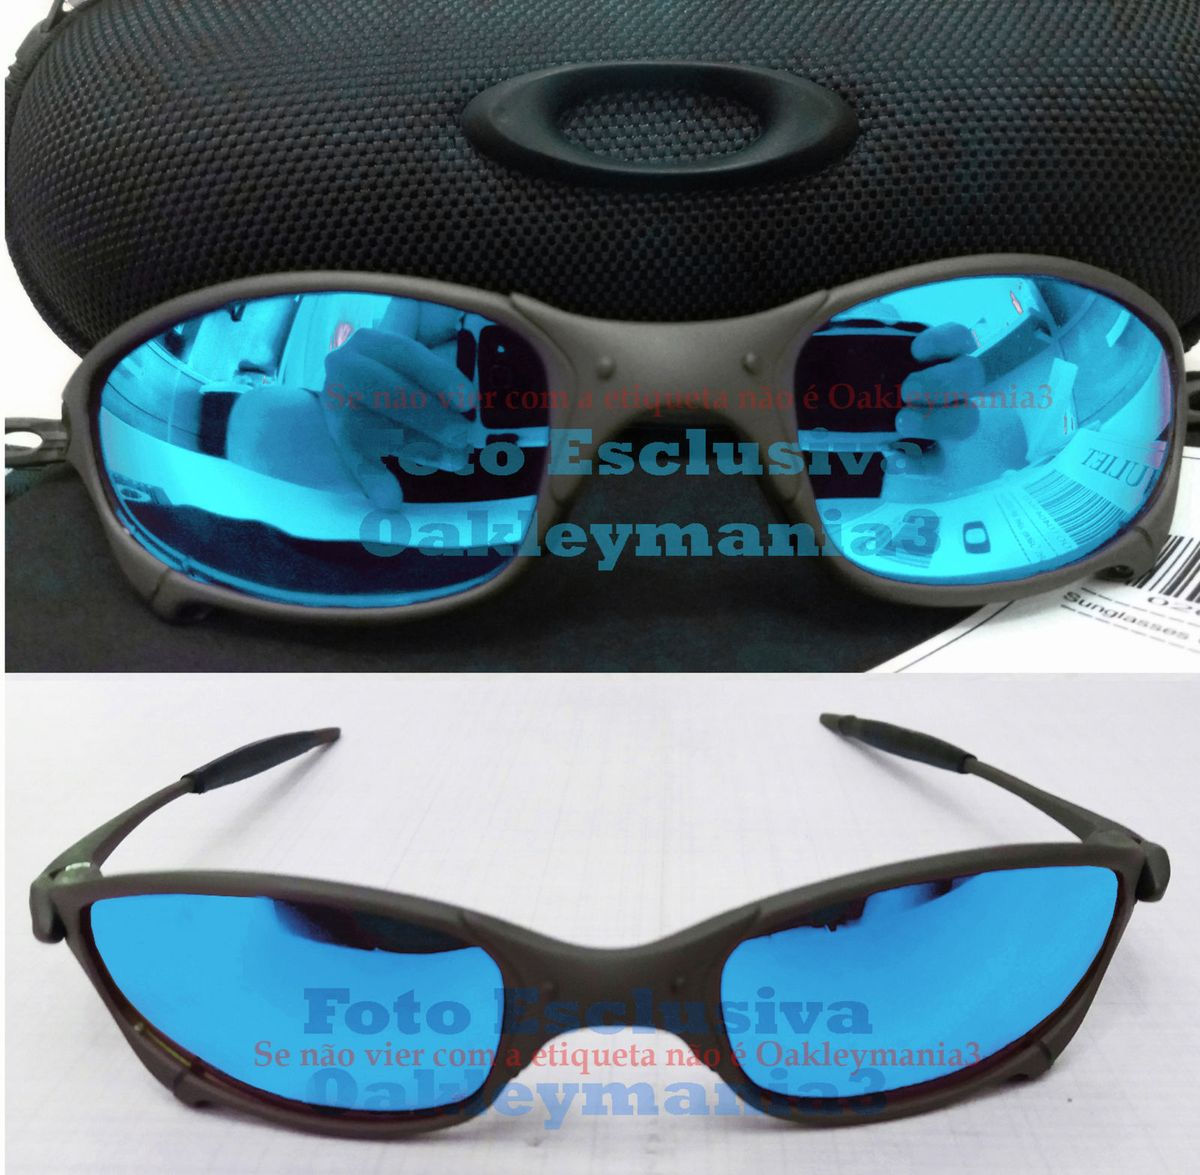 39760aa62 oculos oakley juliet xmetal lente azul clara ice thug polarizada + case  rigido porta oculos u.s.a